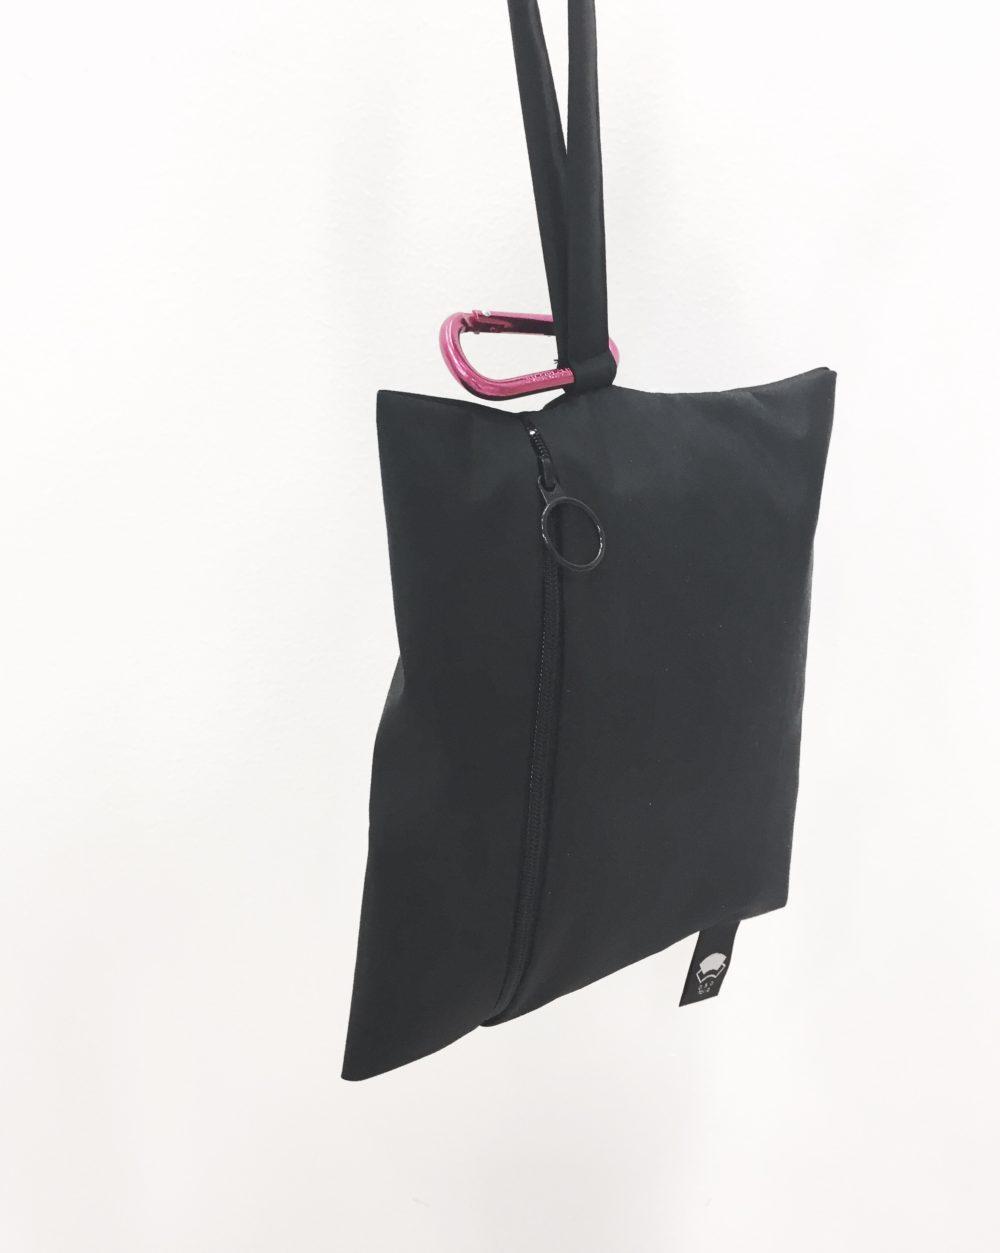 袋osatokyo